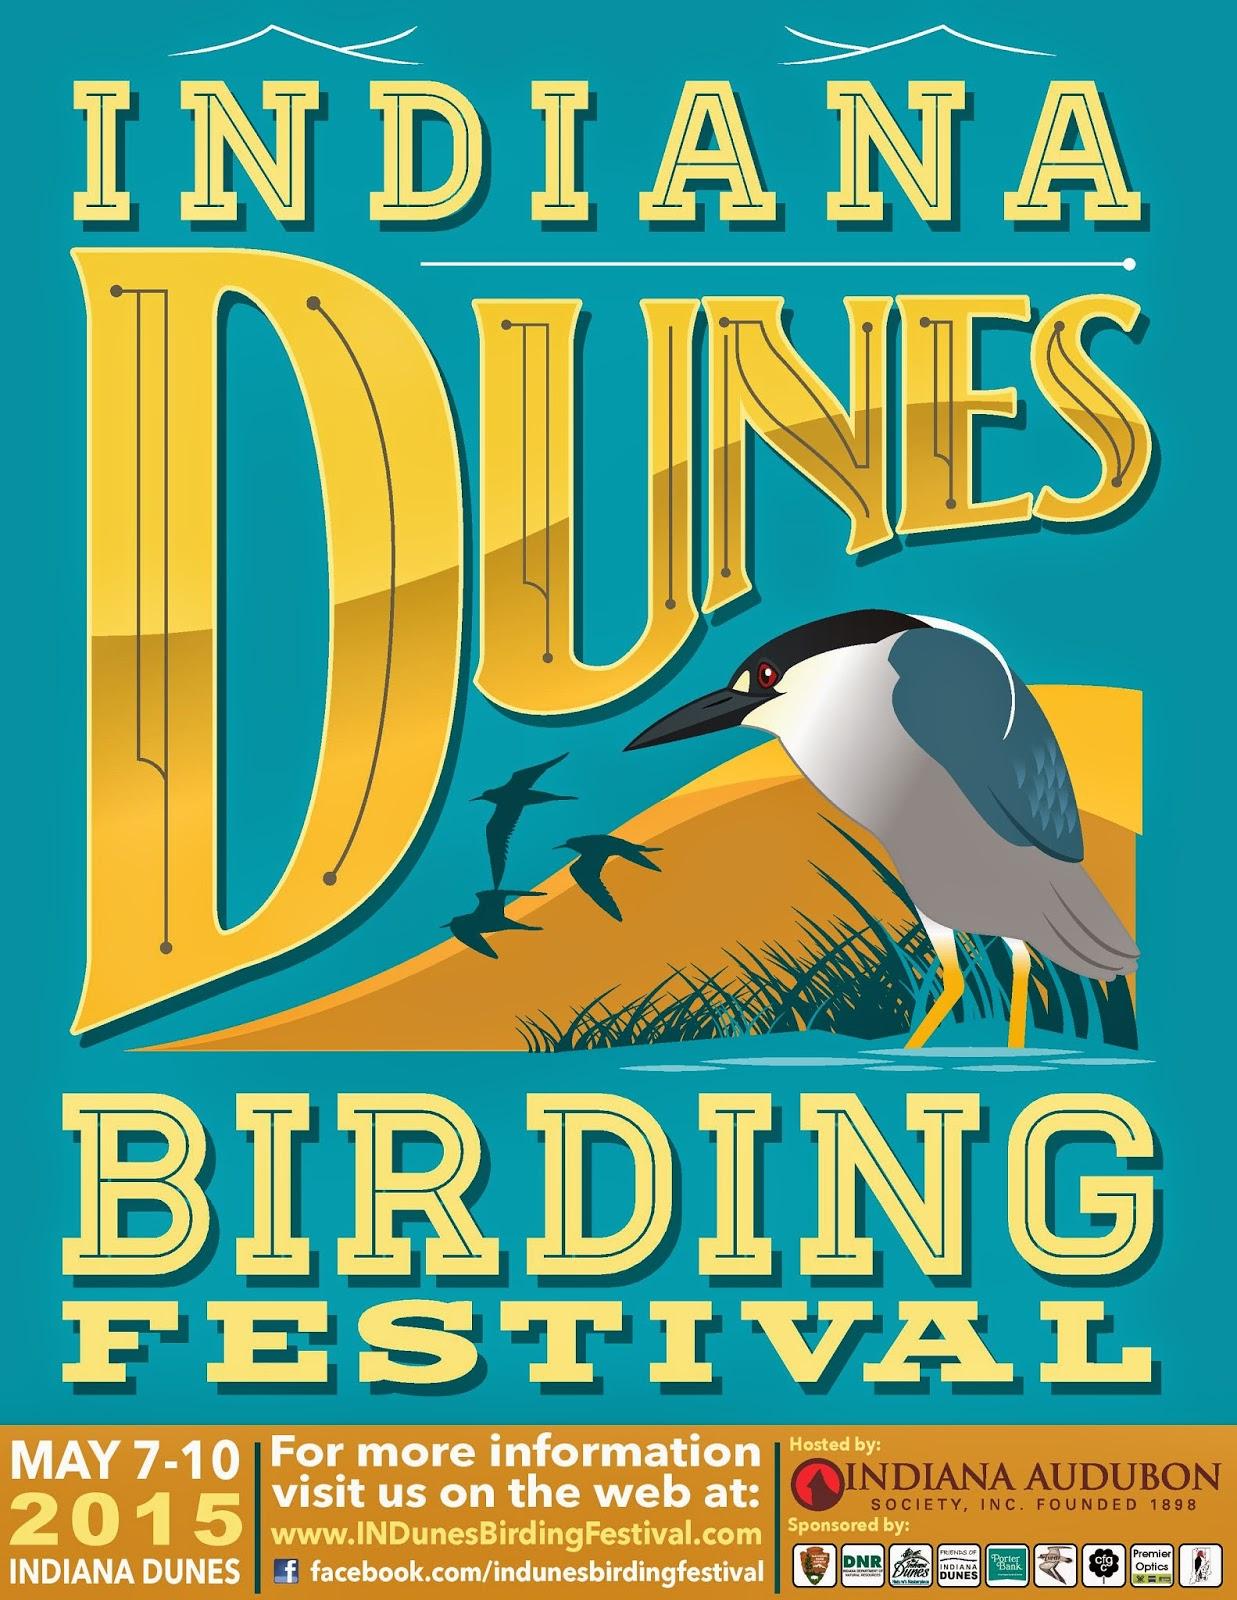 http://www.indunesbirdingfestival.com/